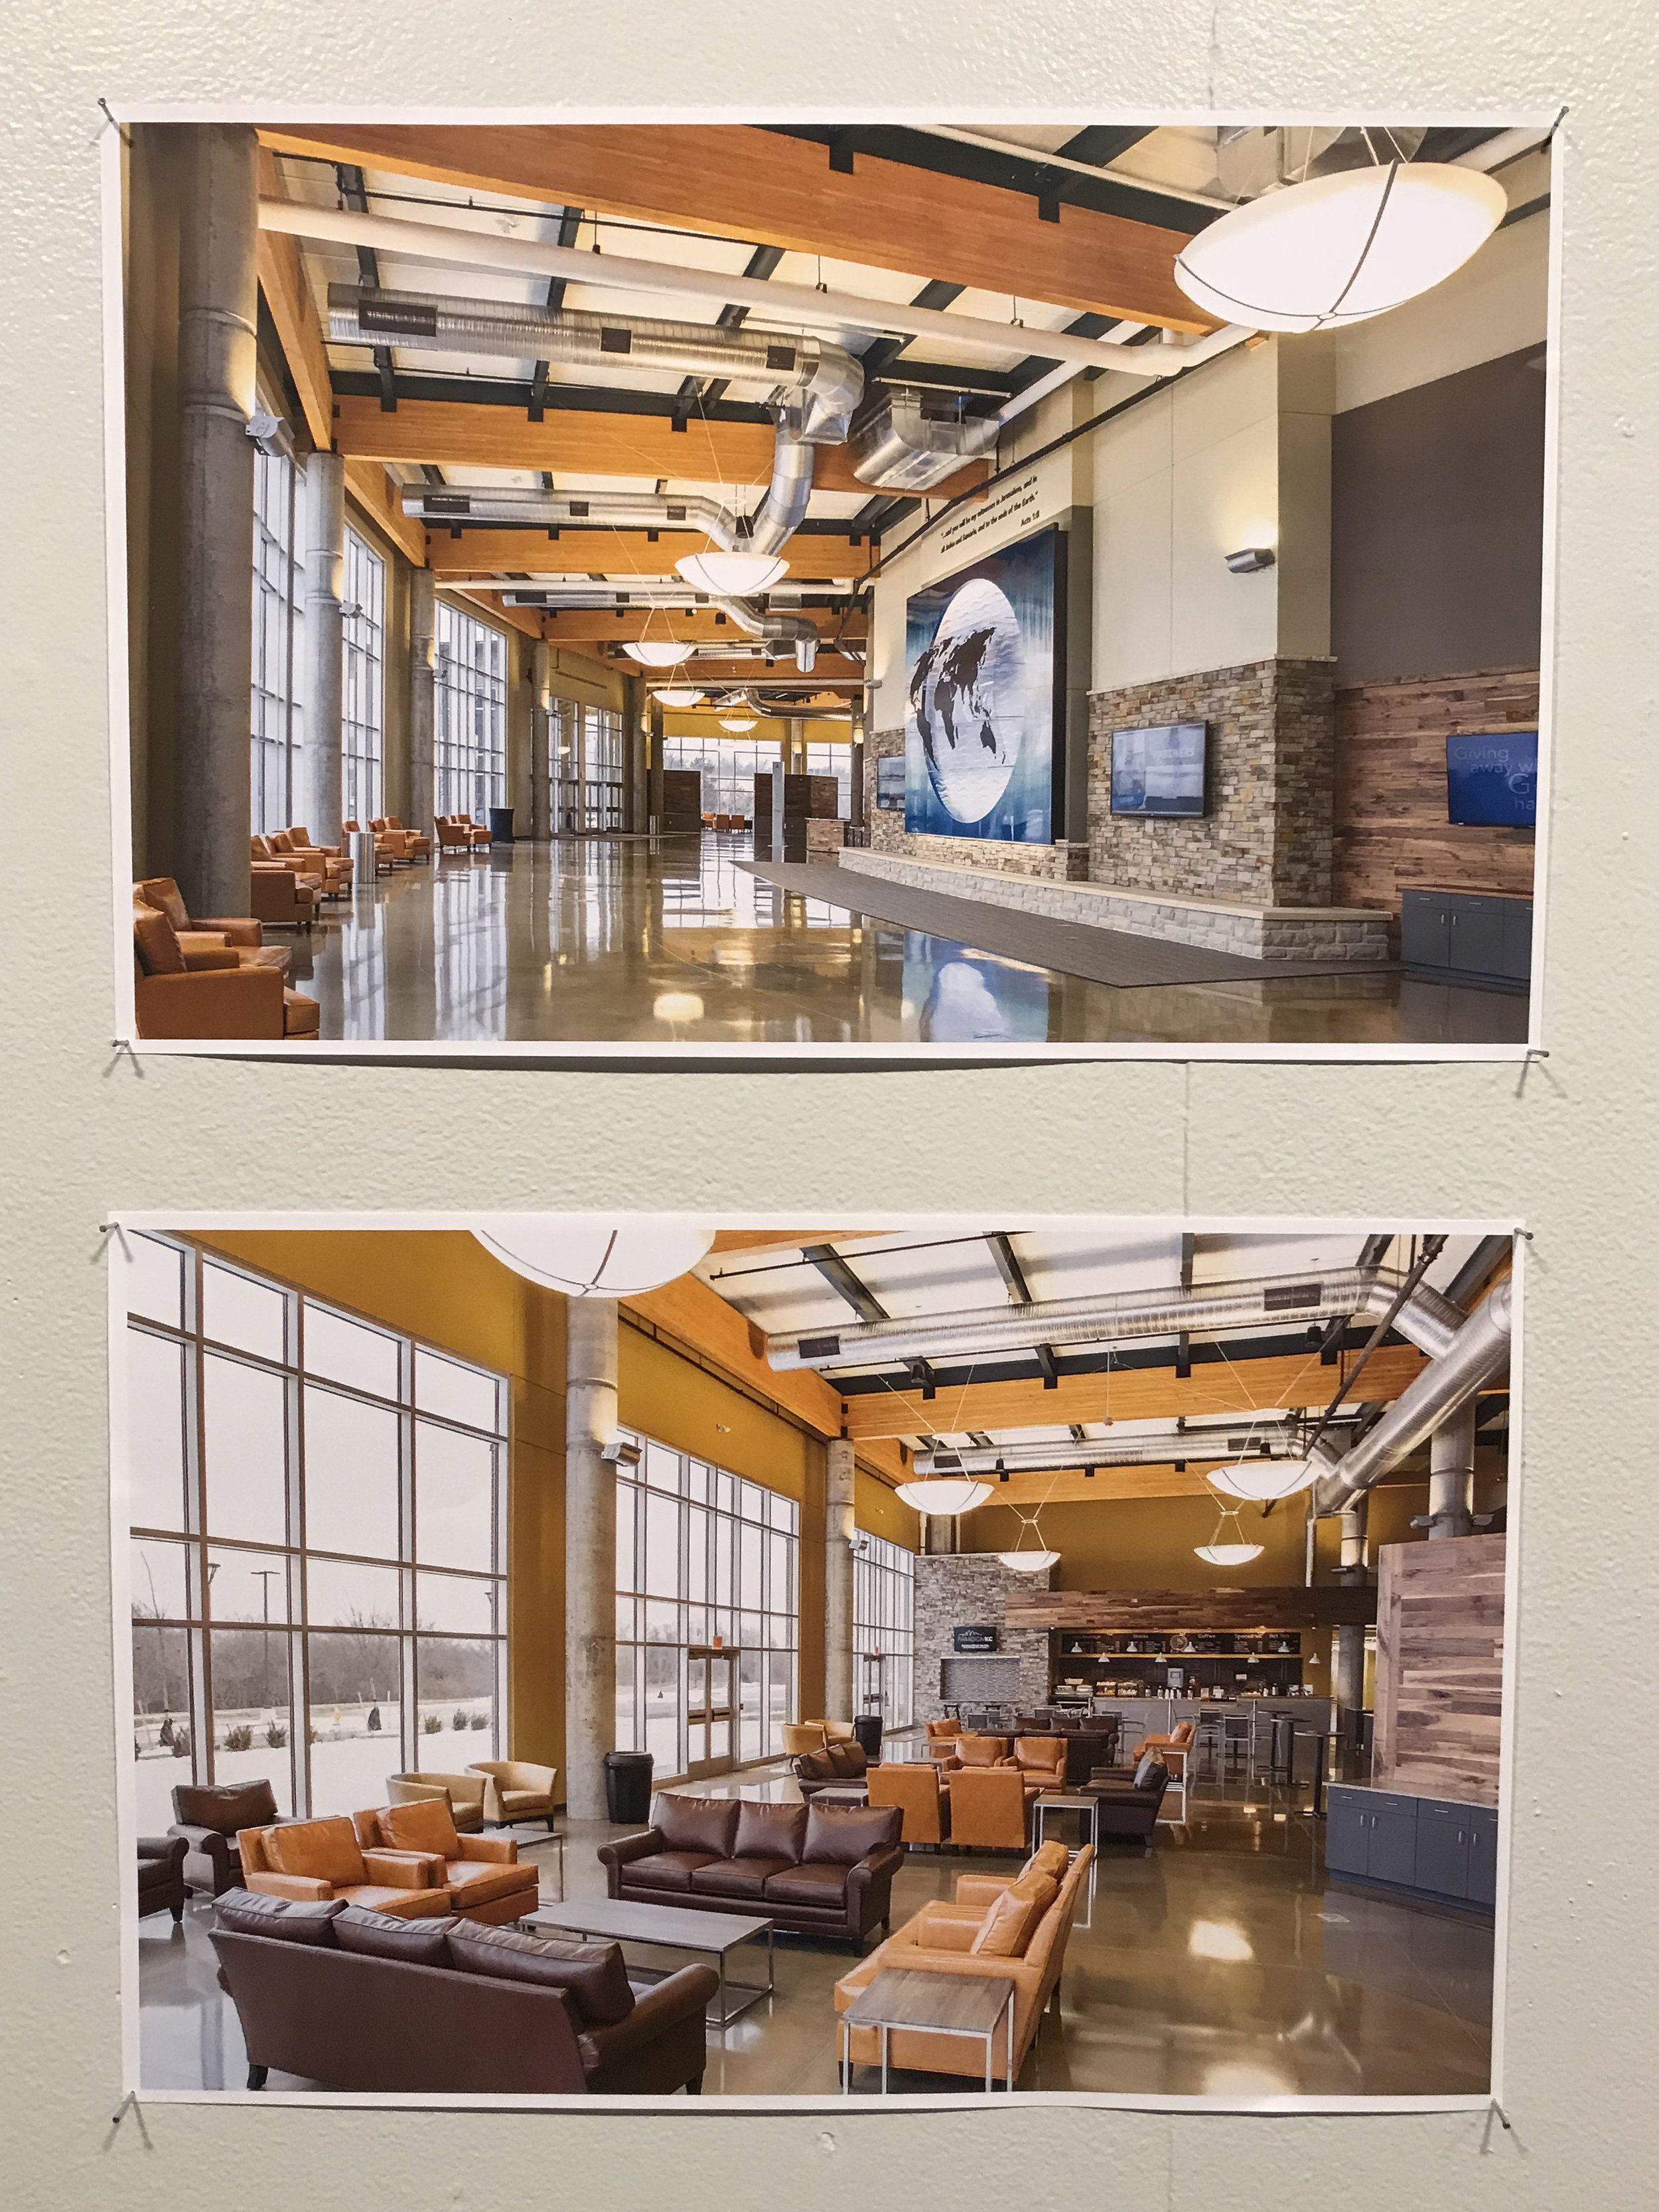 Abundant Life Baptist Church, Skyler Phelps, Project Architect